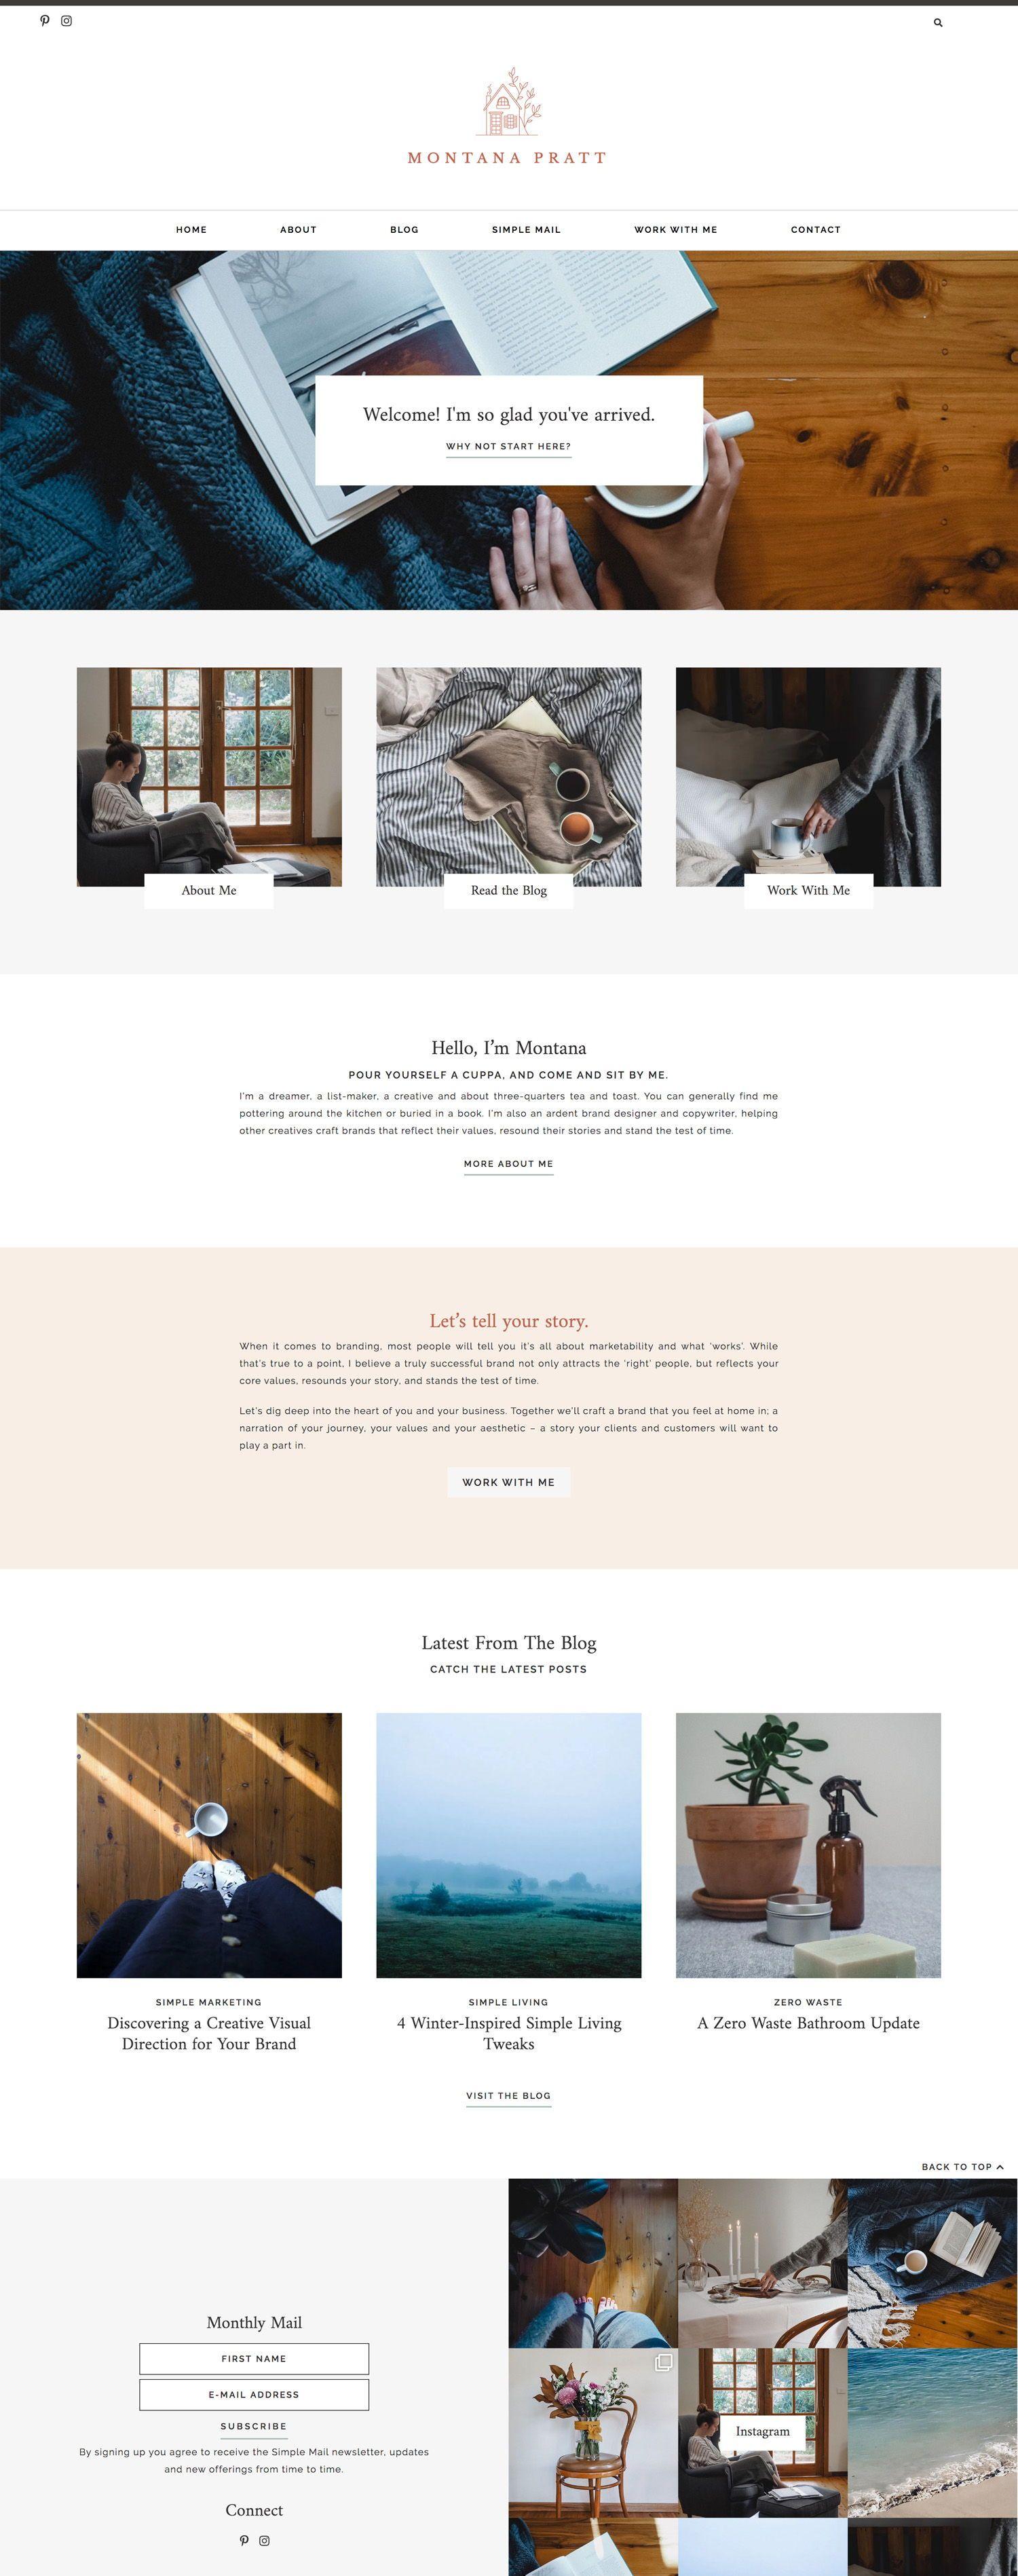 Montana Pratt Is A Brand Designer That Helps Business Owners Craft A Brand That Website Design Inspiration Business Wordpress Website Design Squarespace Design